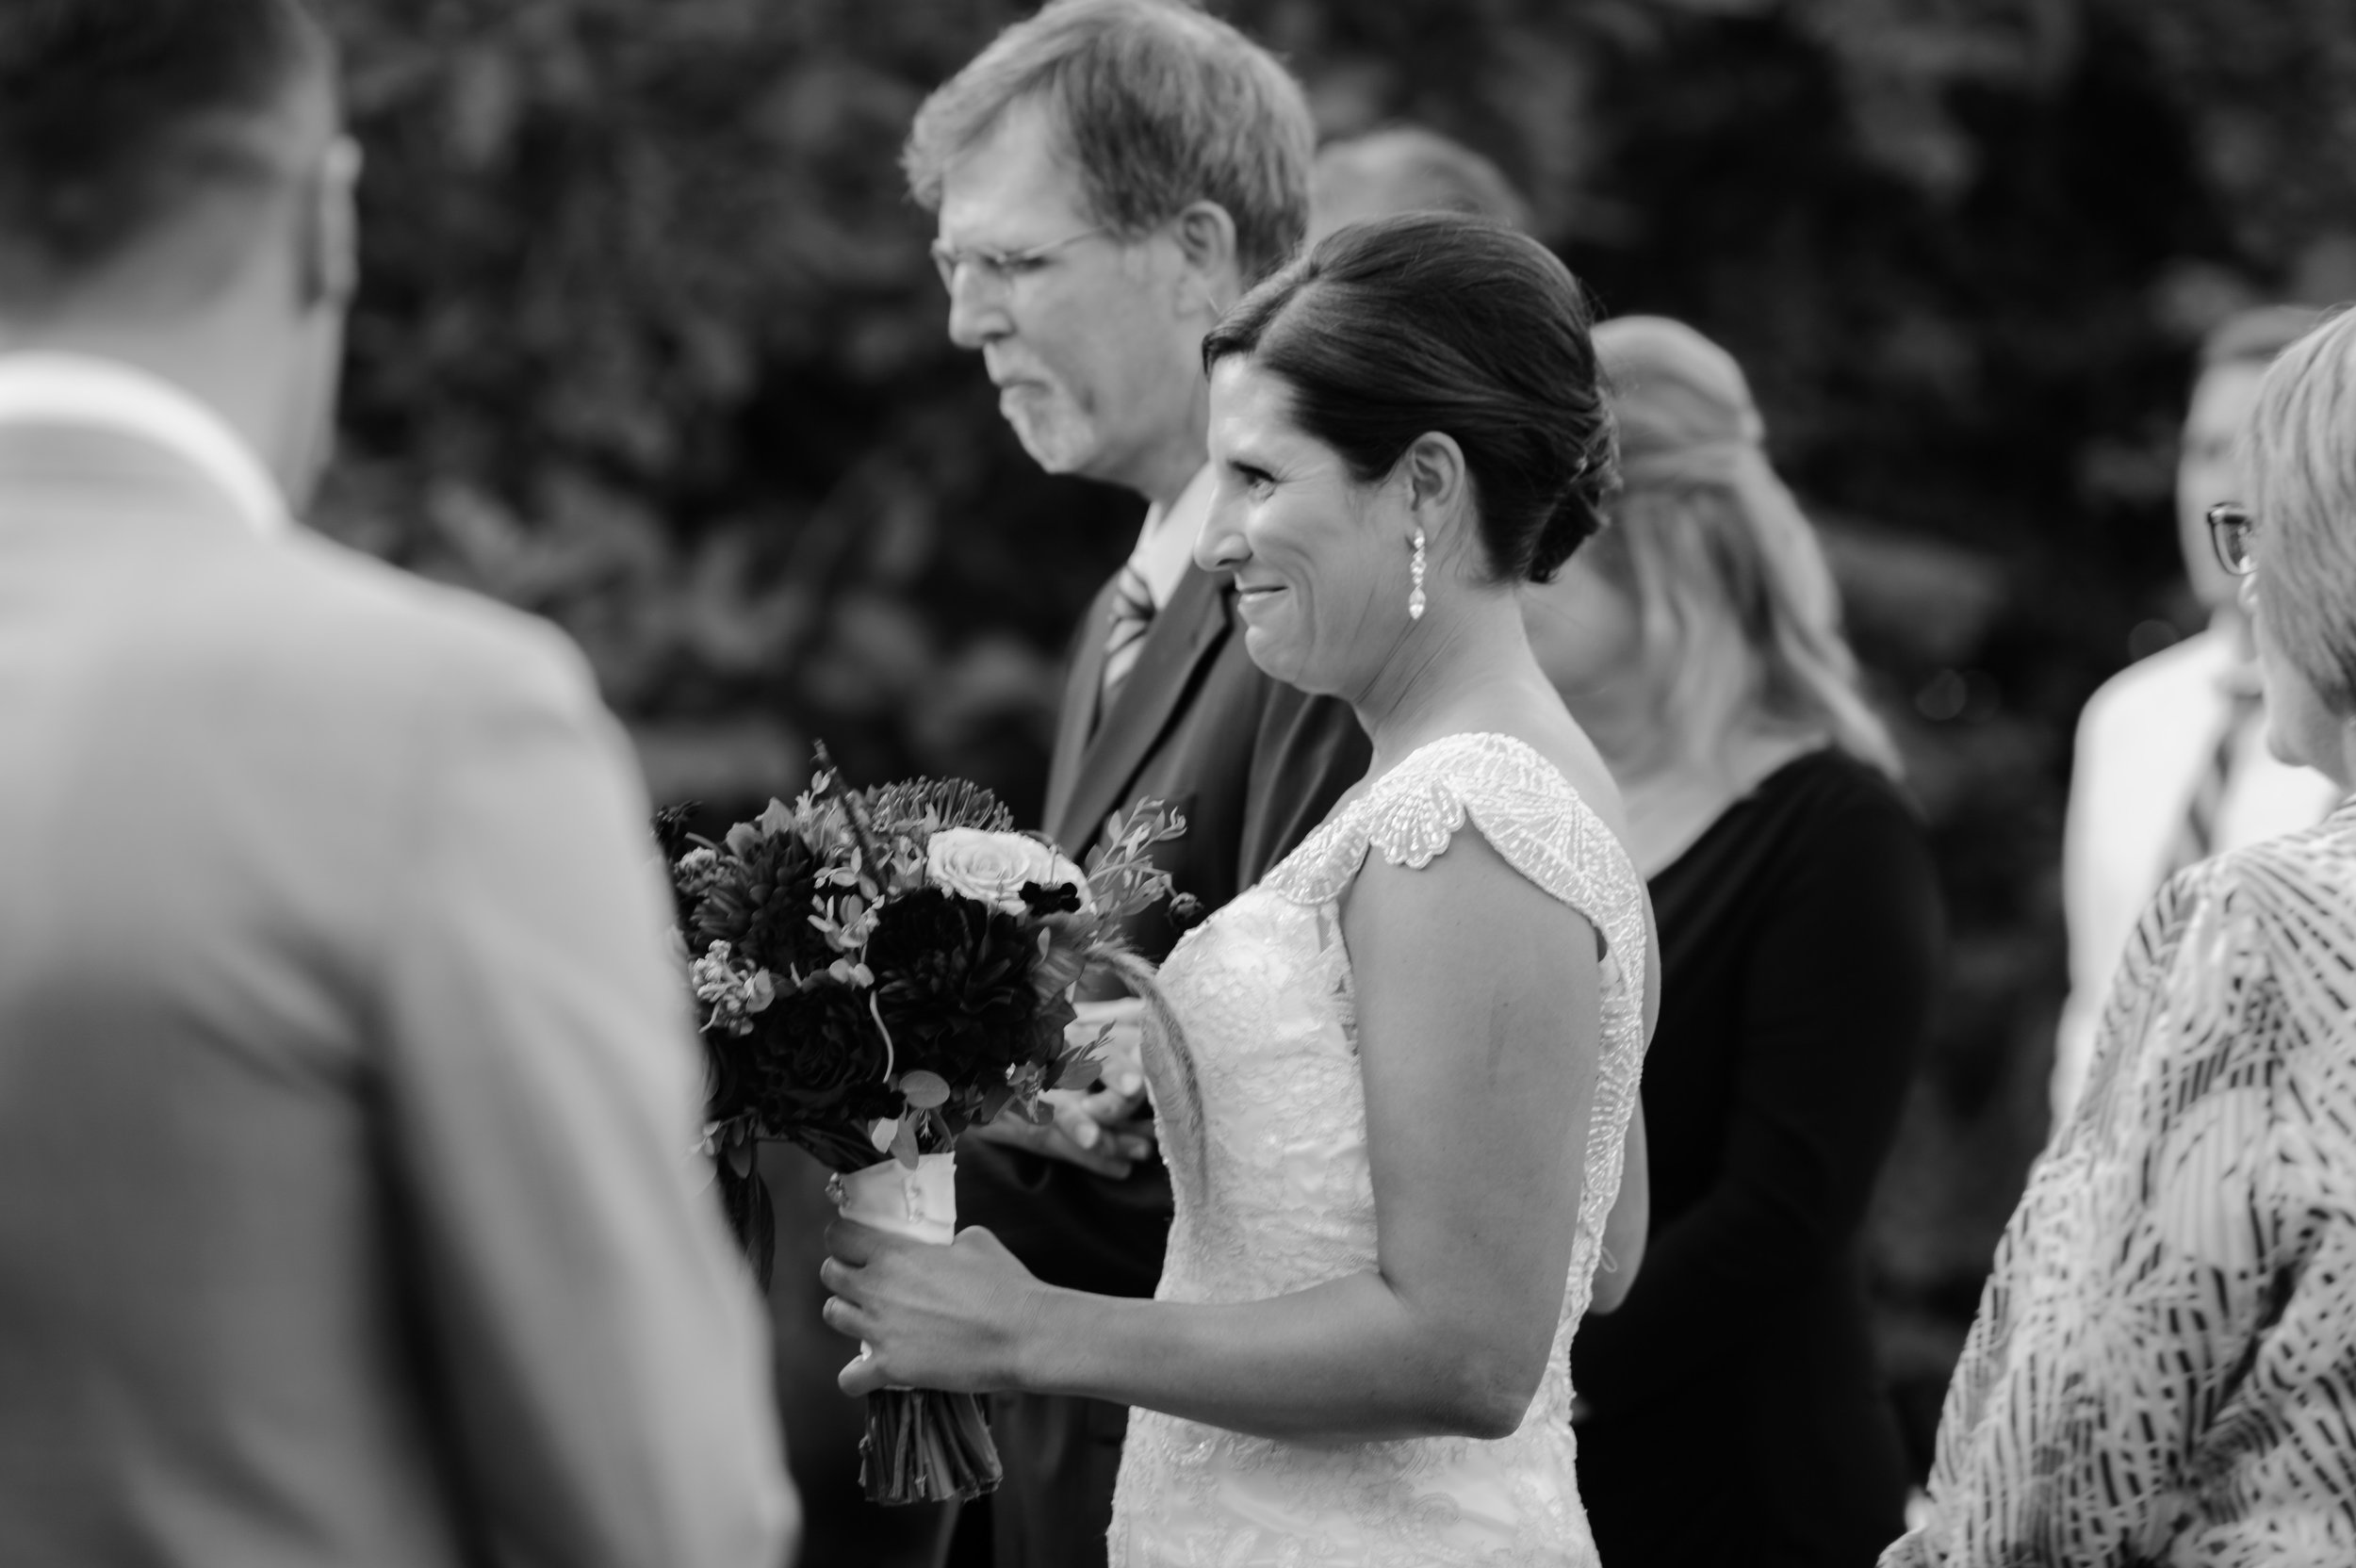 annie-brian-004-antiquite-midtown-sacramento-wedding-photographer-katherine-nicole-photography.JPG